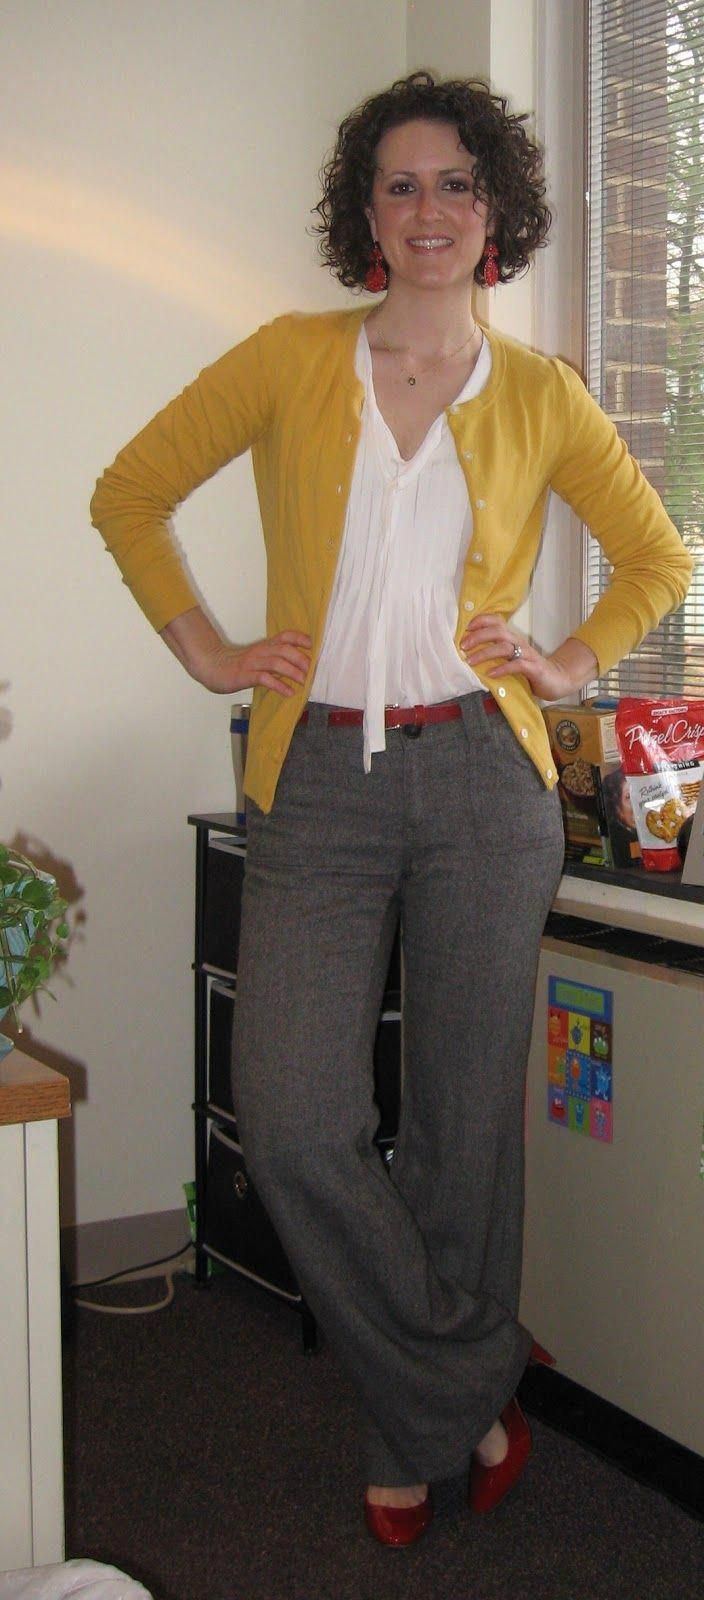 yellow cardigan #teacherfashionover40animalprints #women'sfashionover40wintersty…